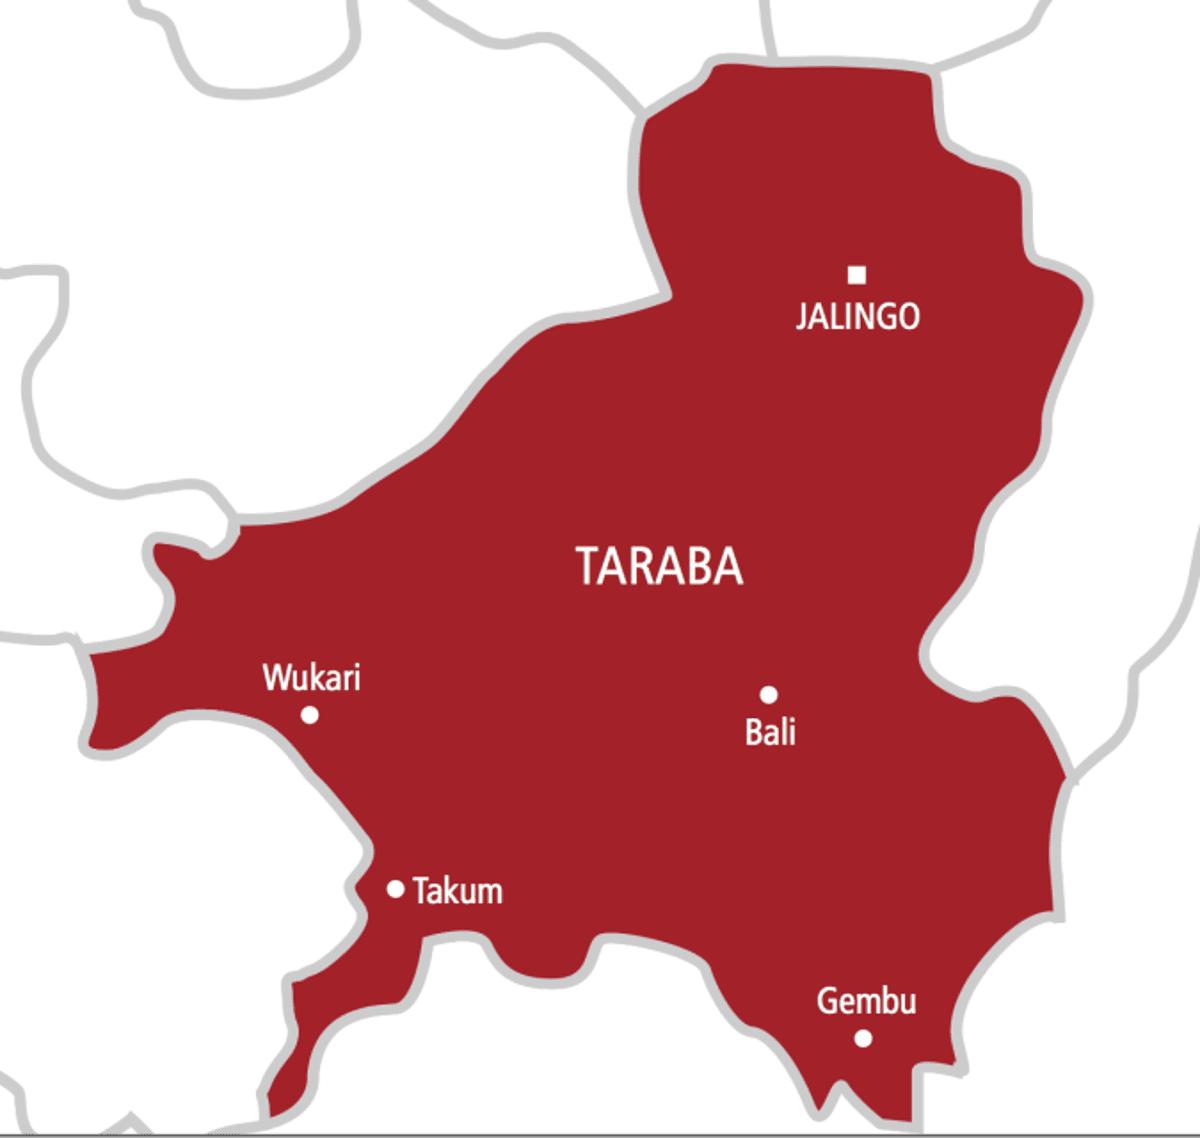 Coronavirus: Taraba closes markets, bans public gathering